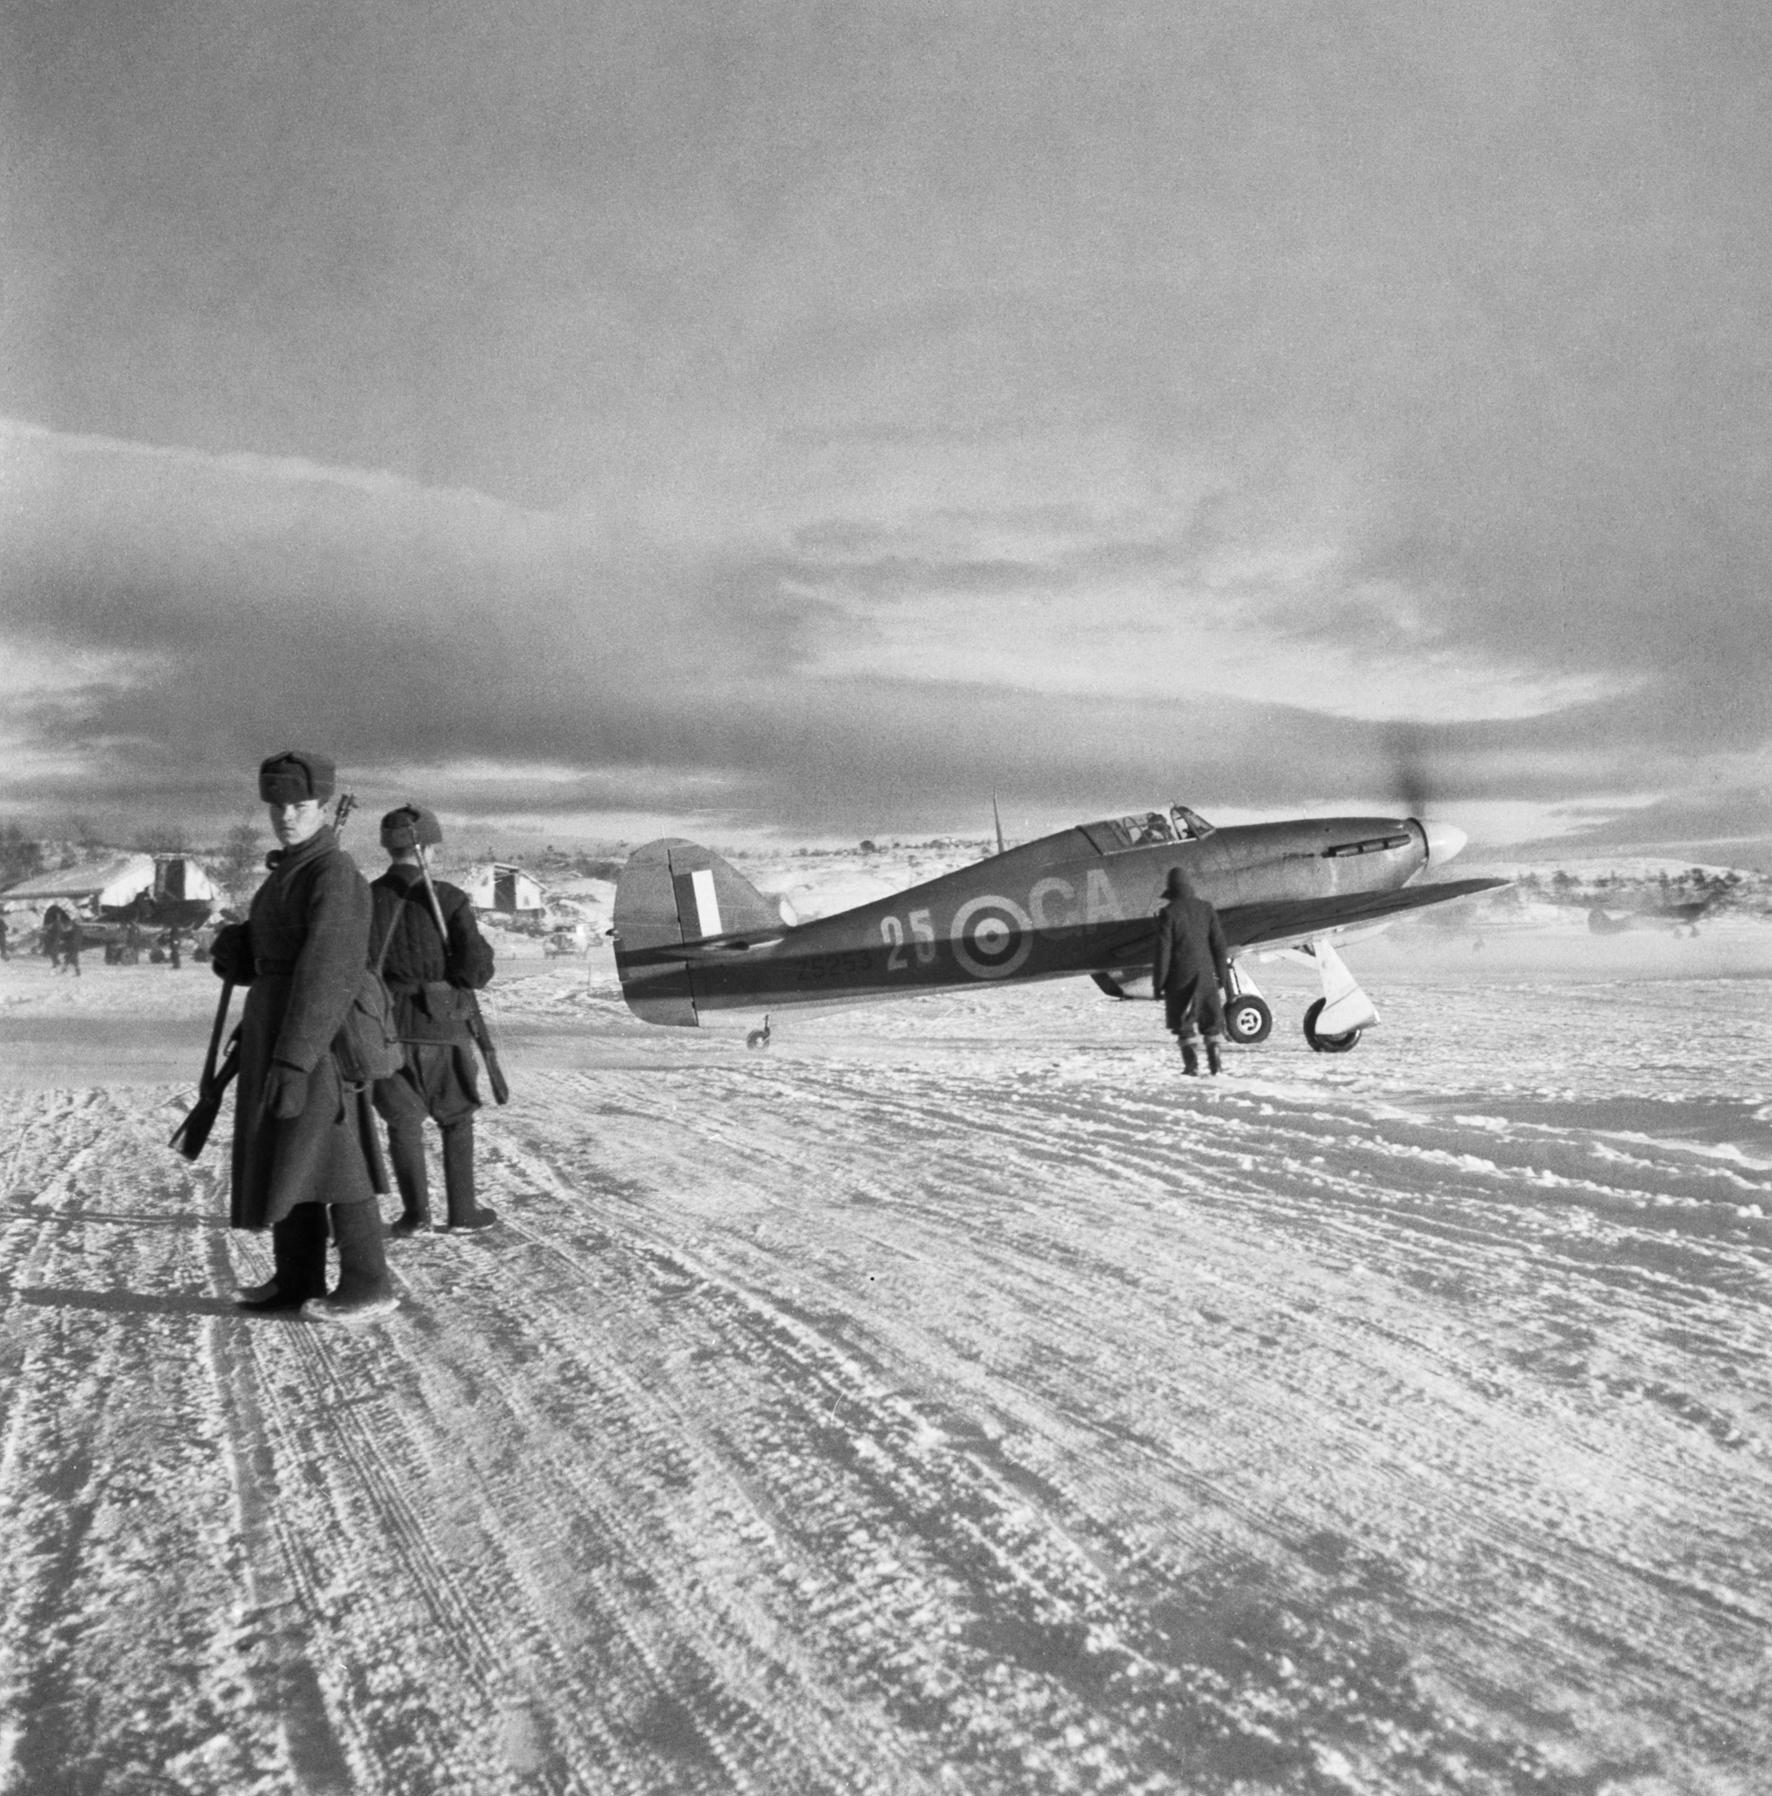 No. 240 Squadron RAF